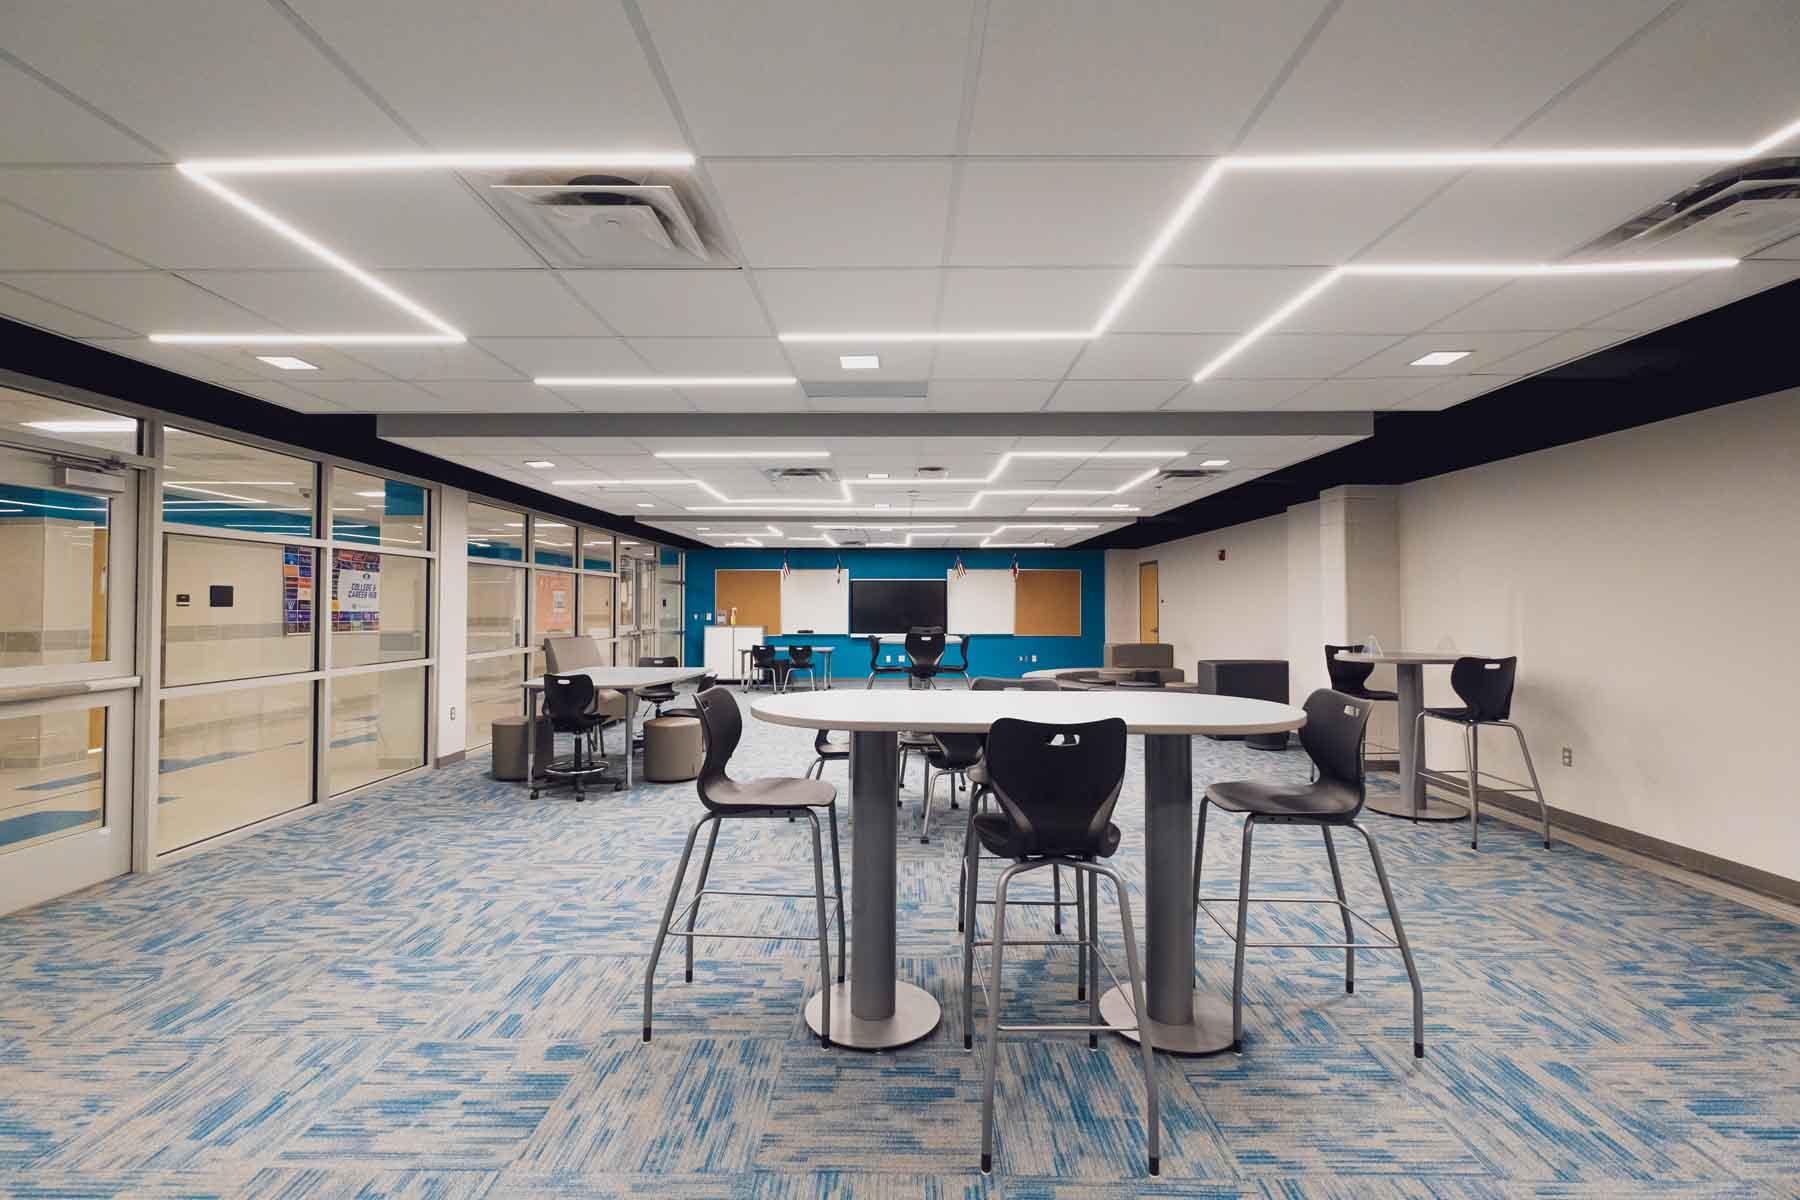 Collaboration Area, Sam Houston Hight School Renos